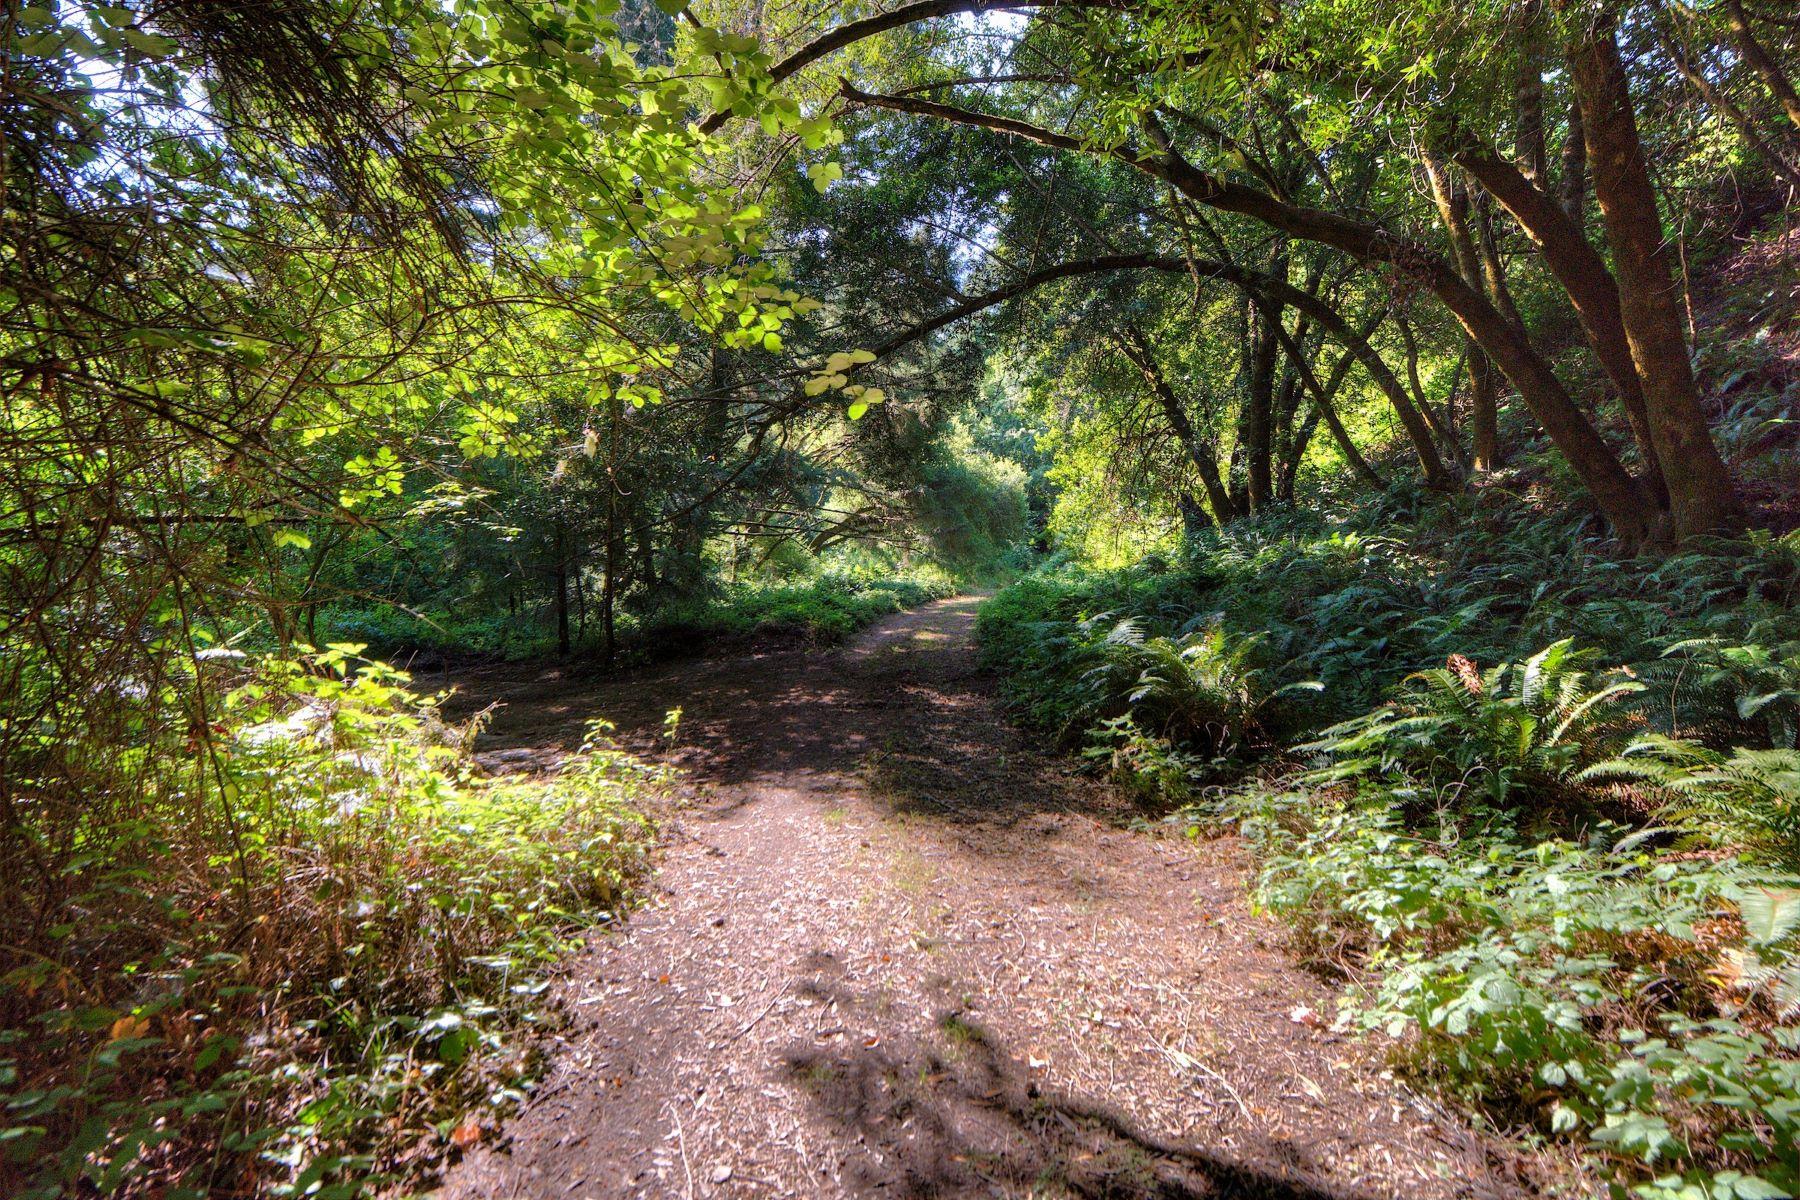 Land for Sale at Refuge and Retreat 222 Camino Margarita Nicasio, California 94946 United States